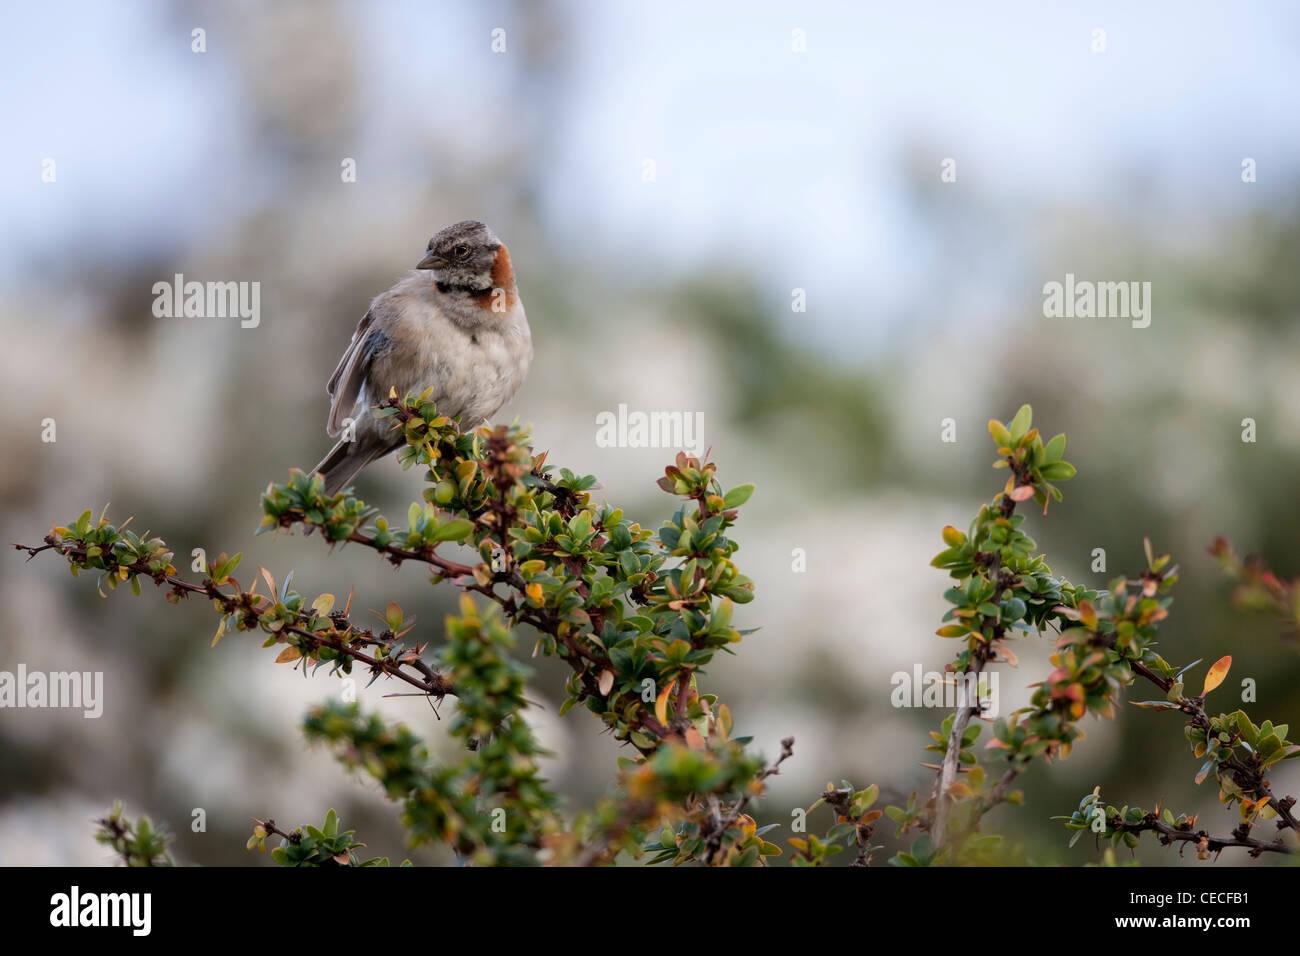 Rufous-collared Sparrow (Zonotrichia capensis australis) in Ushuaia, Tierra Del Fuego, Argentina. Stock Photo